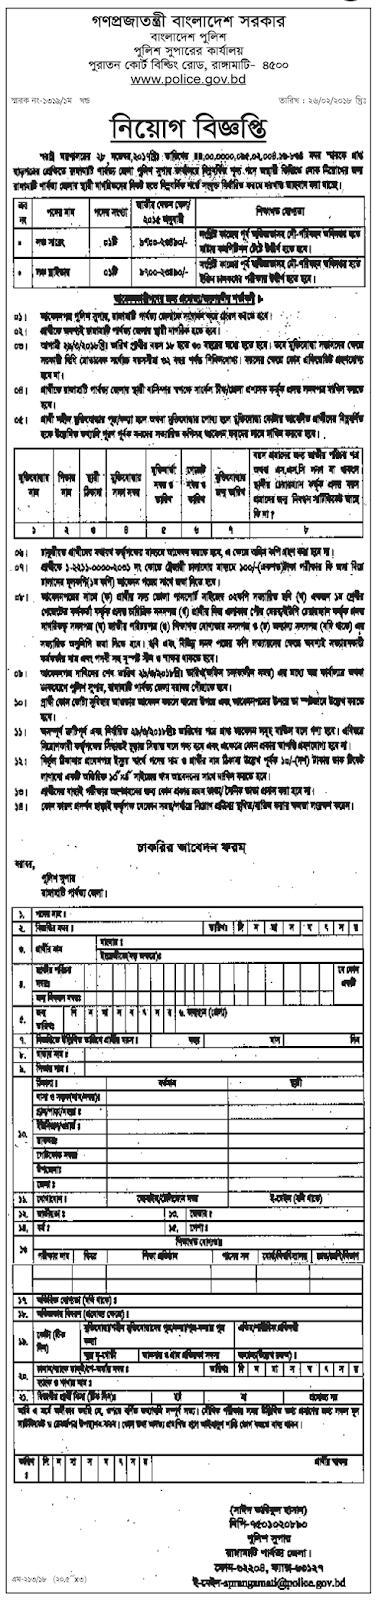 Bangladesh Police Rangamati Job Circular 2018